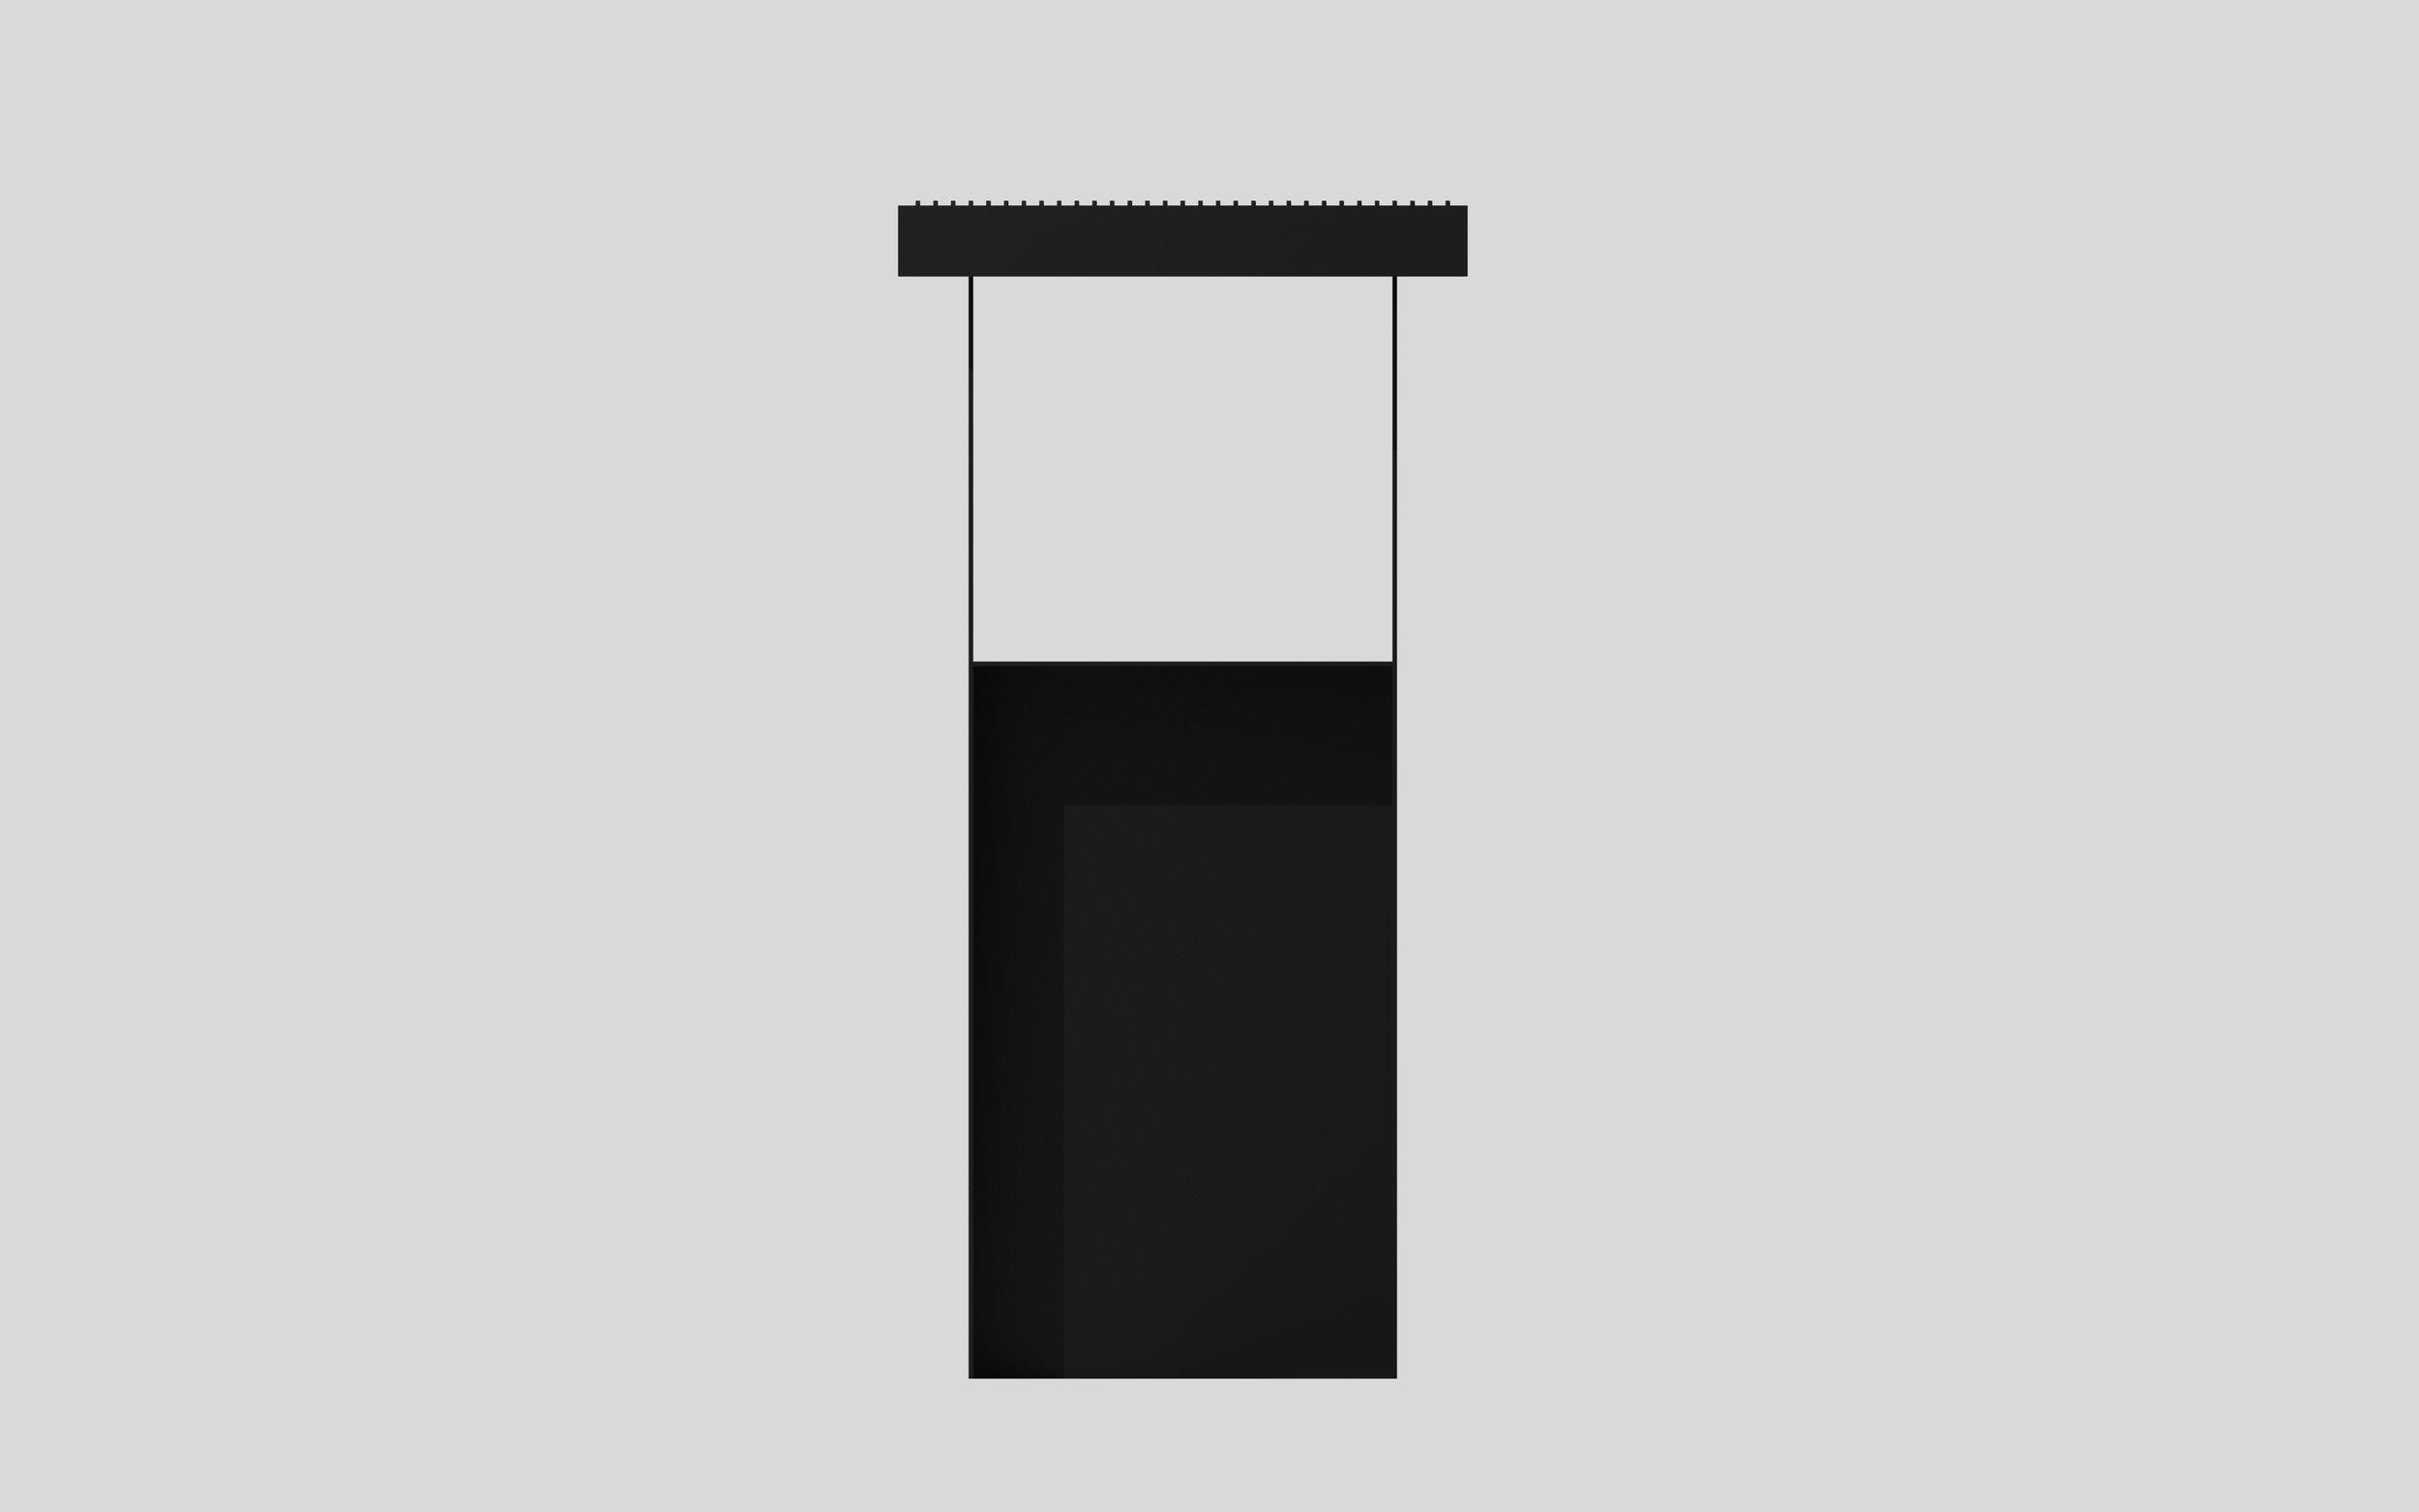 sidetable_bobin_03112018 (1).48 (1).jpg